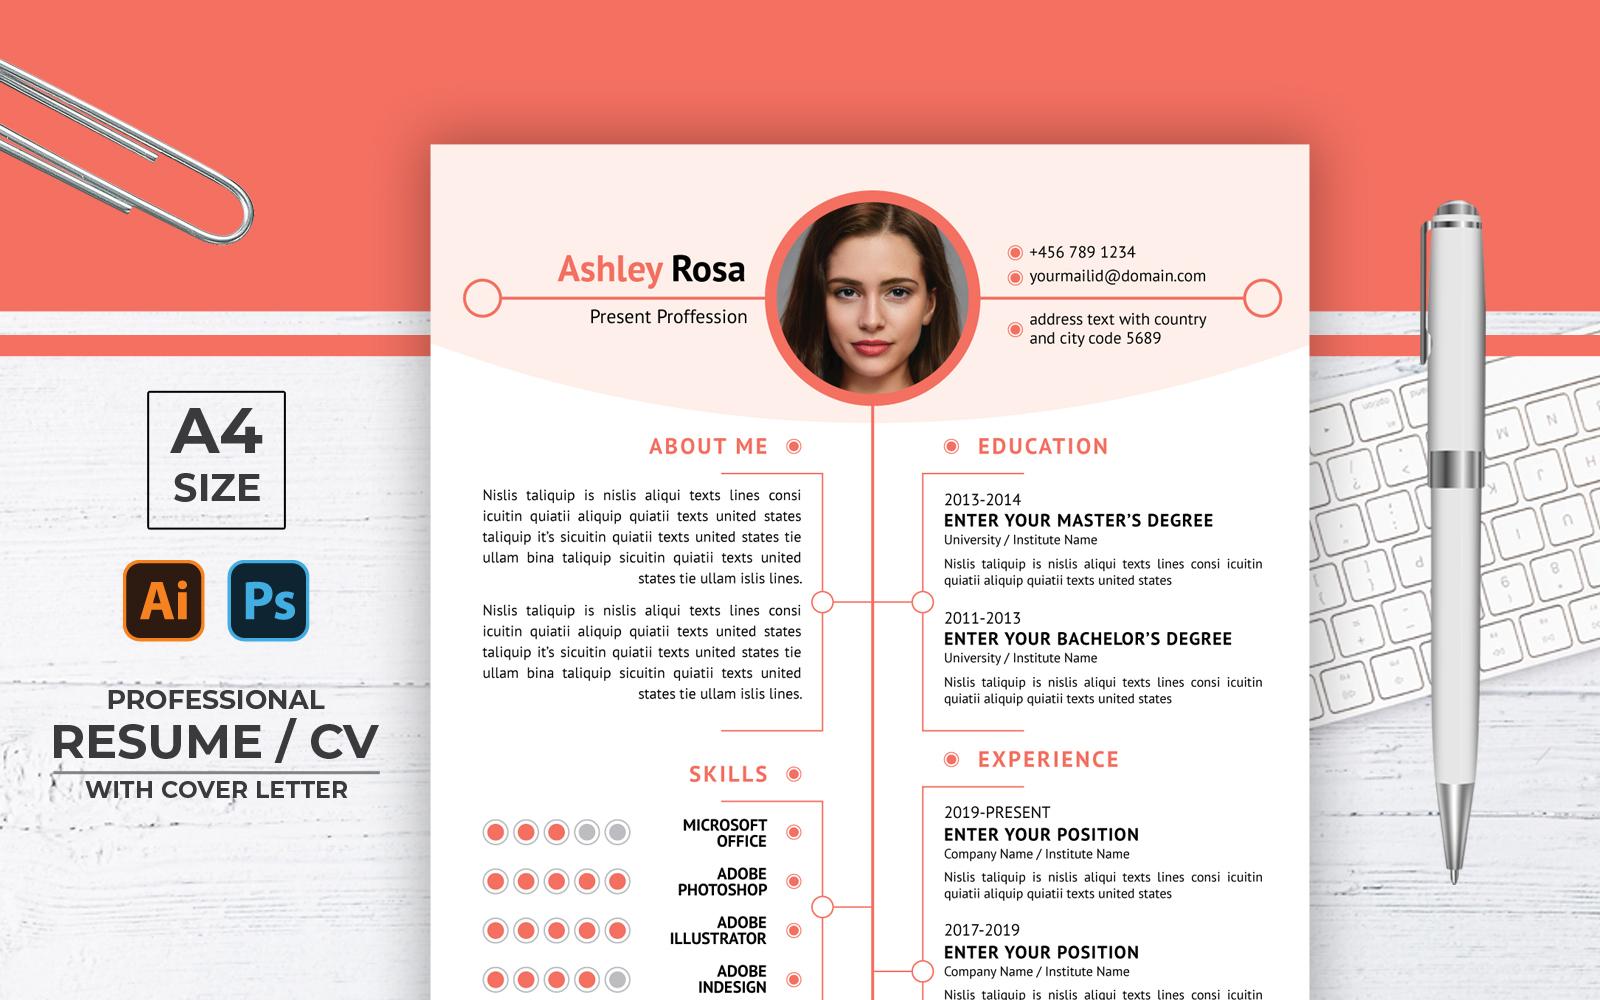 Ashley Rosa Creative CV №123162